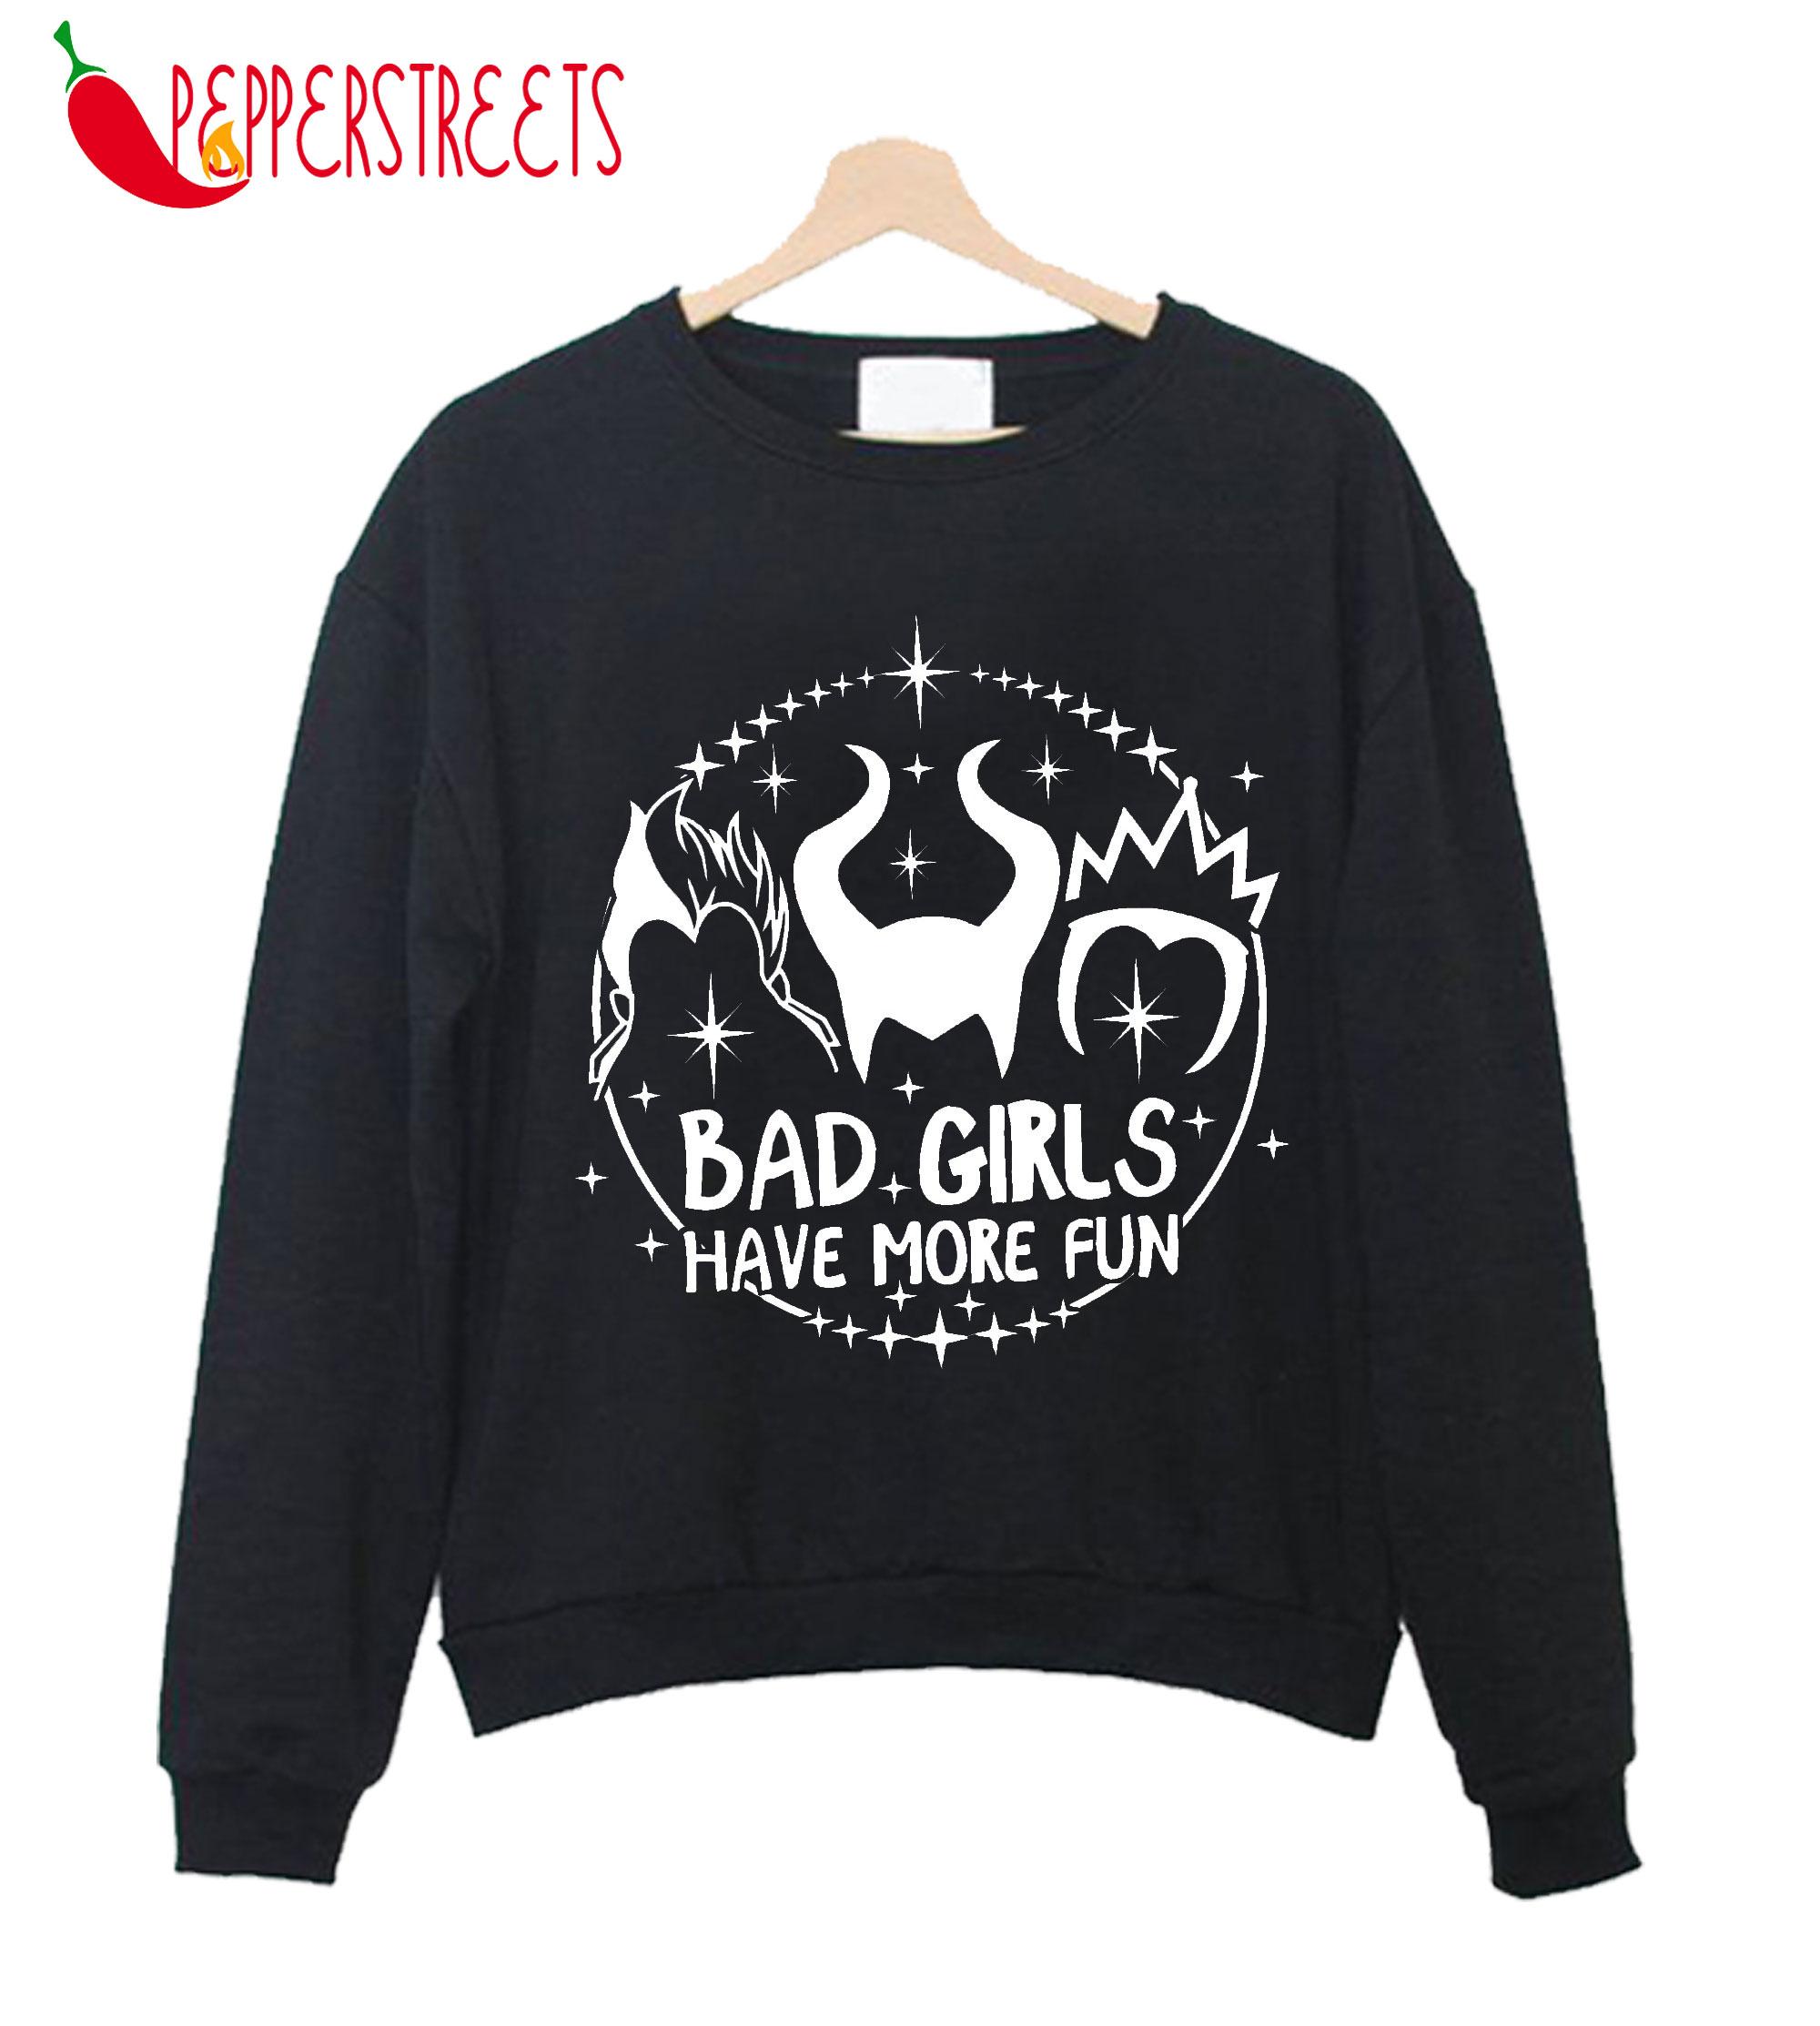 Bad Girls Have More Fun Sweatshirt